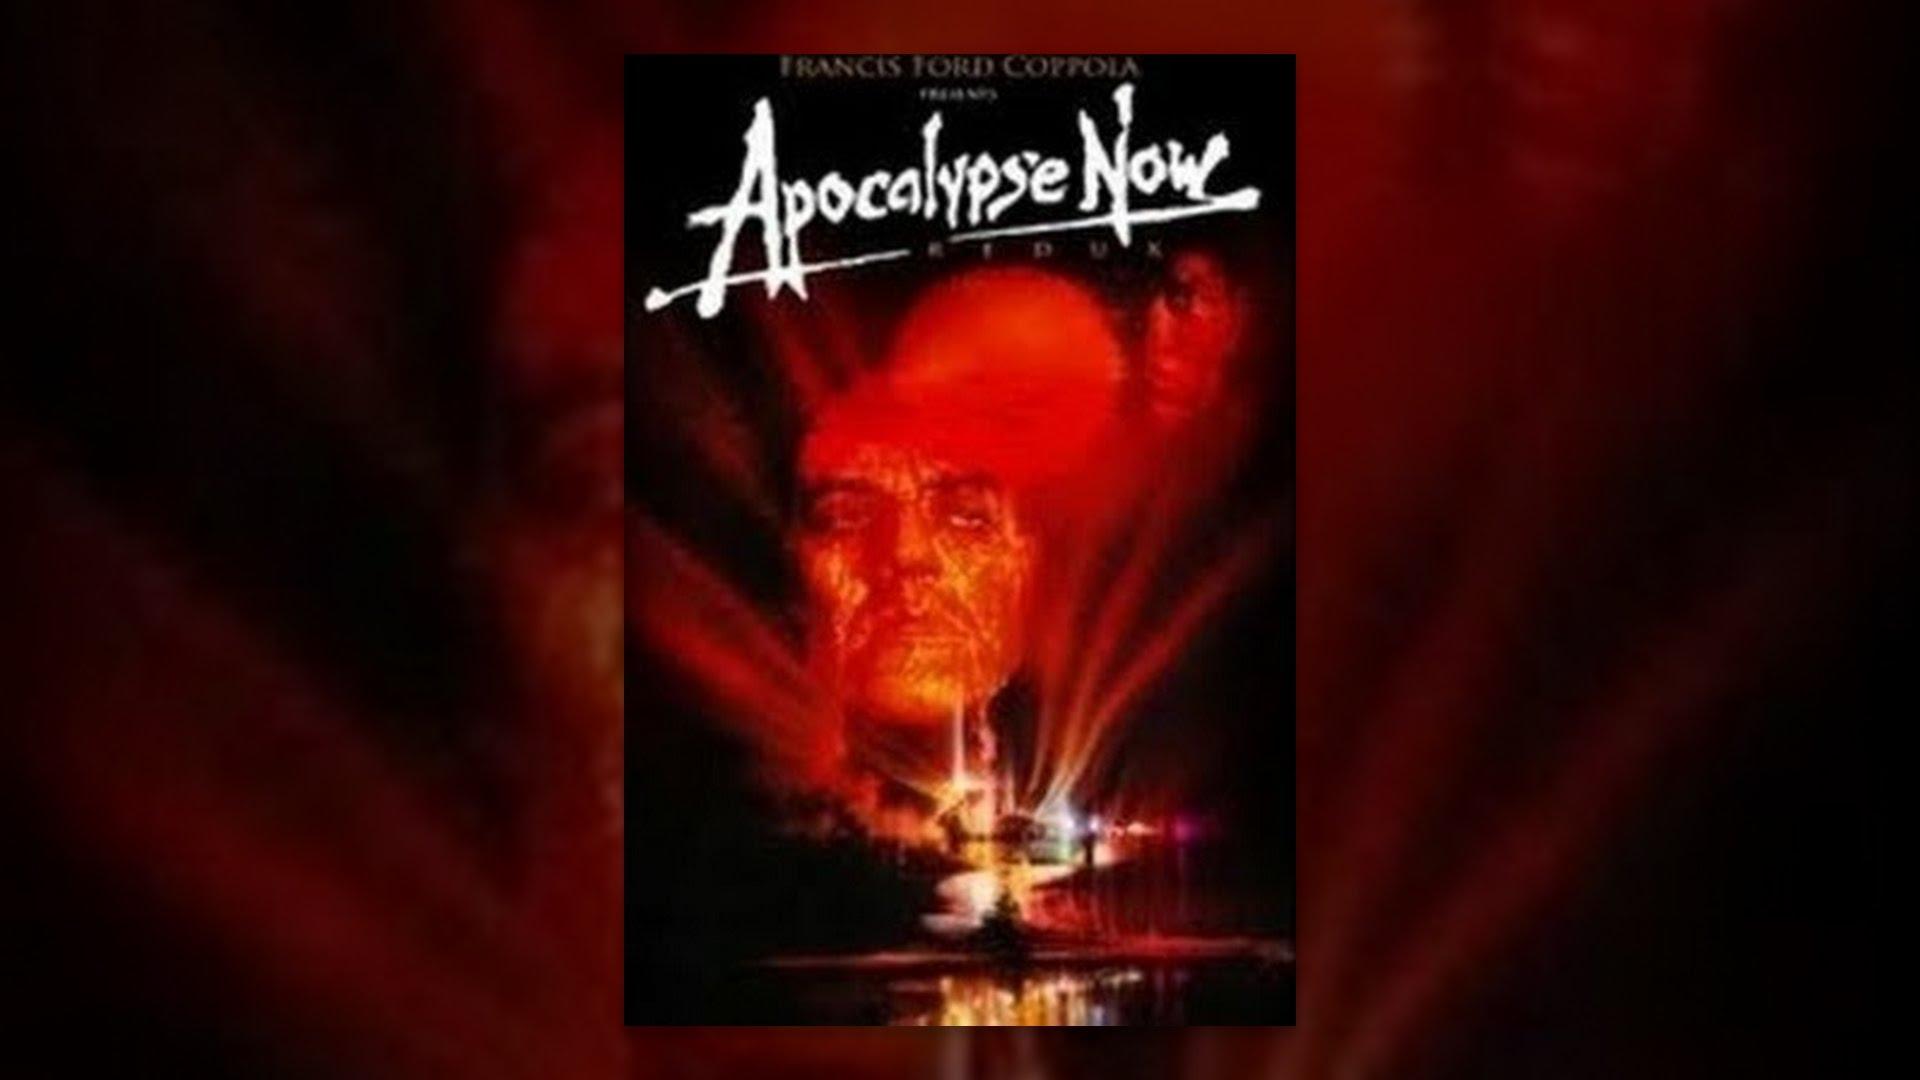 Apocalypse Now Vs Heart of Darkness